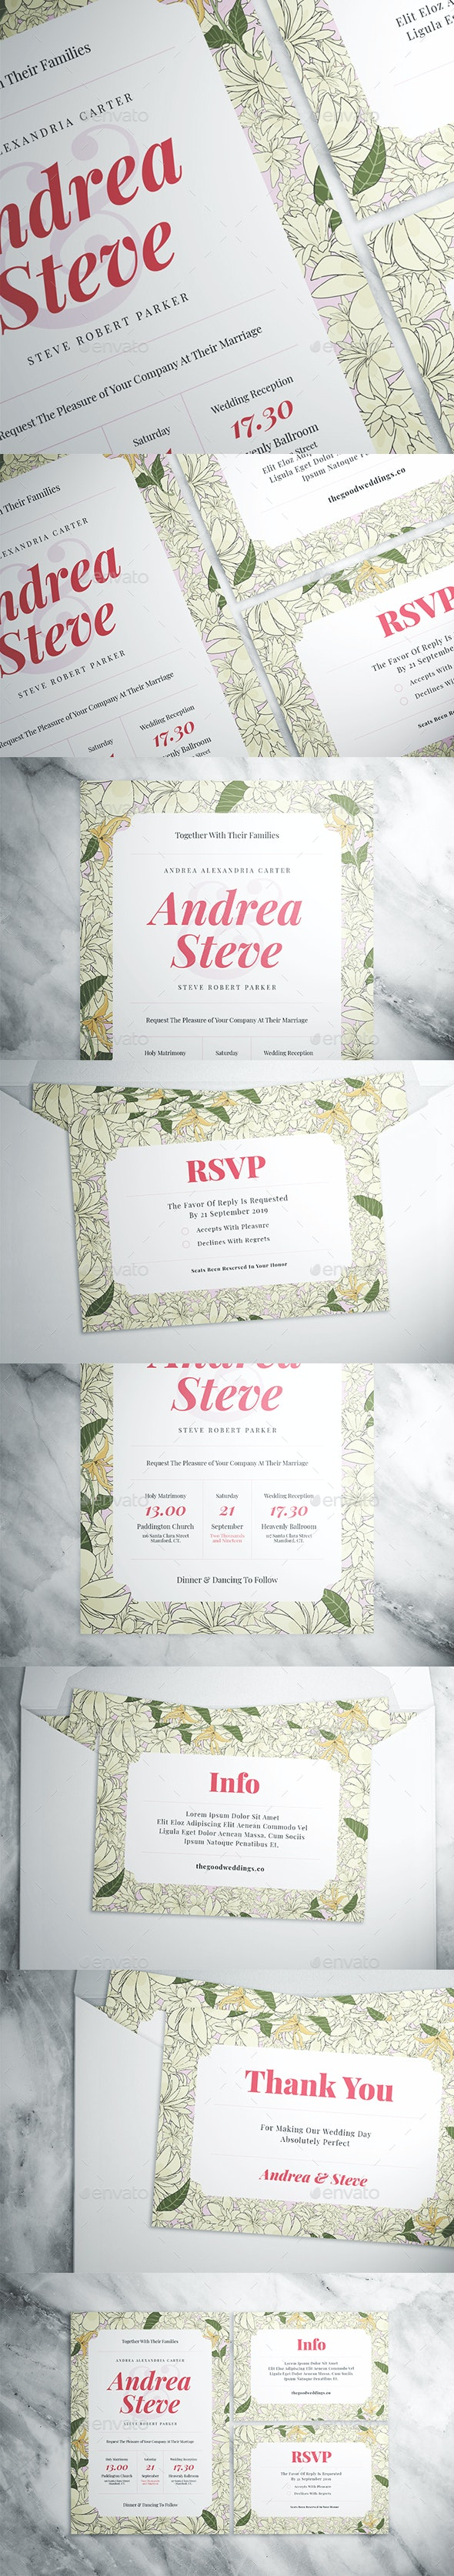 Flower Wedding Suite - Weddings Cards & Invites